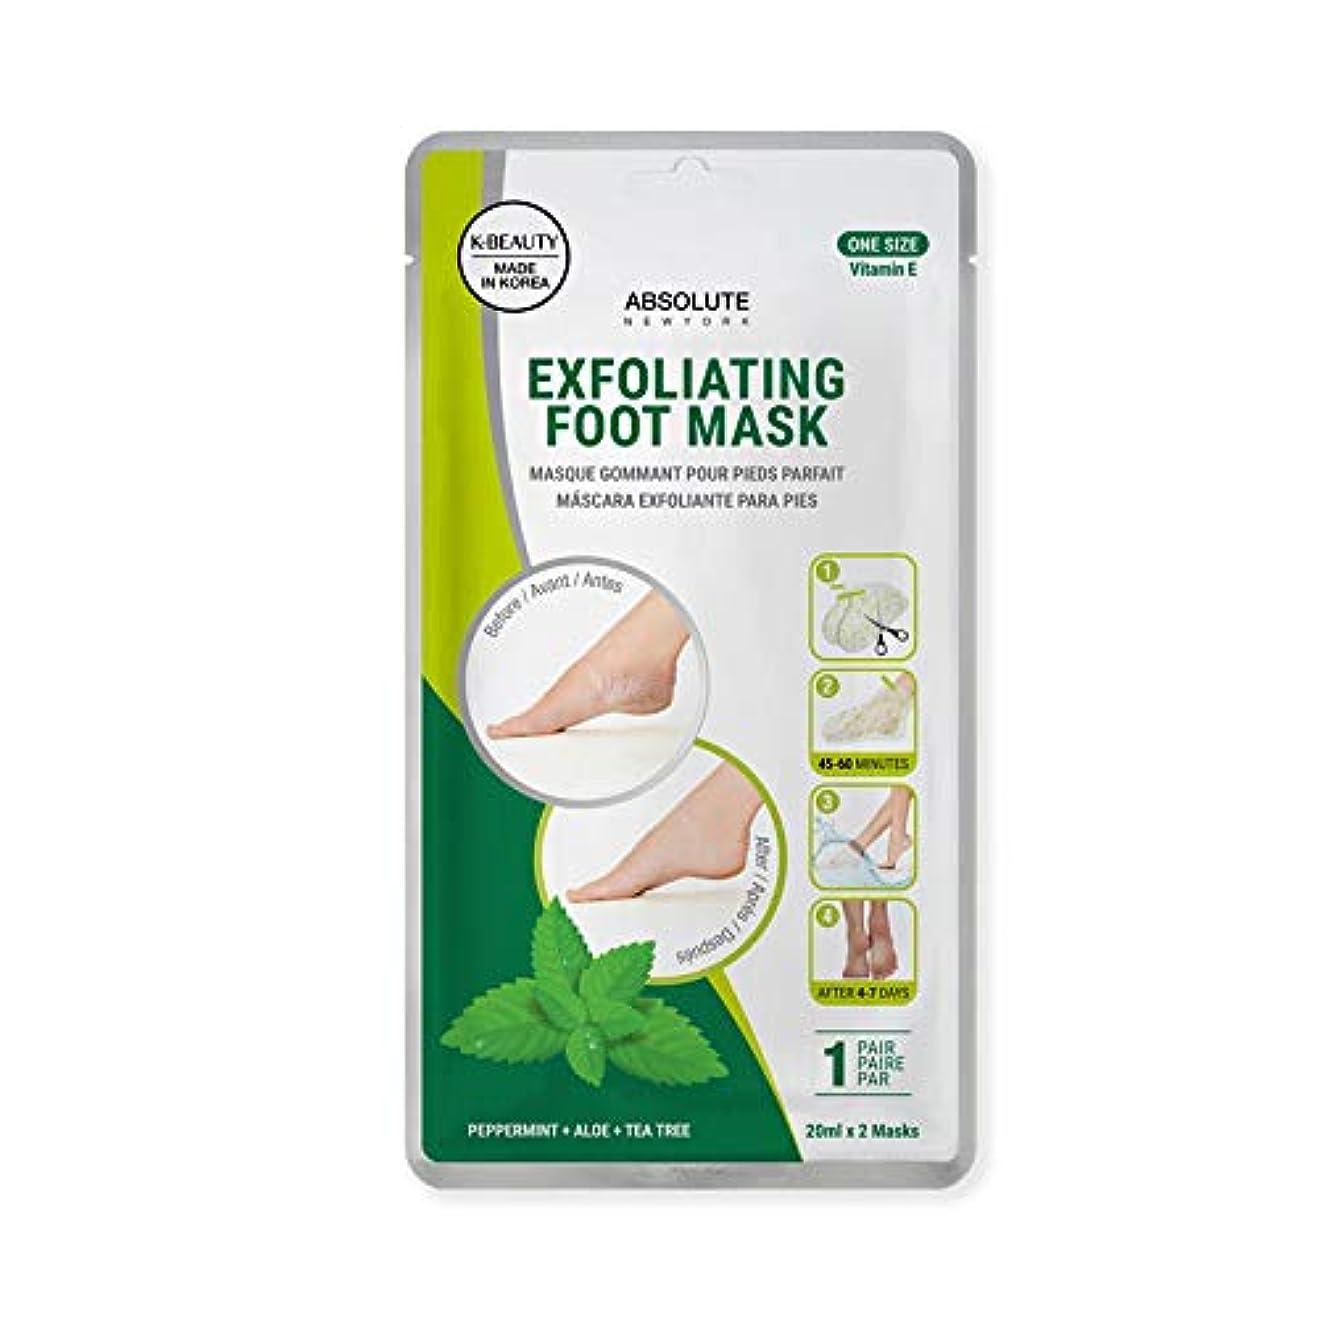 (3 Pack) ABSOLUTE Exfoliating Foot Mask - Peppermint + Aloe + Tea Tree (並行輸入品)